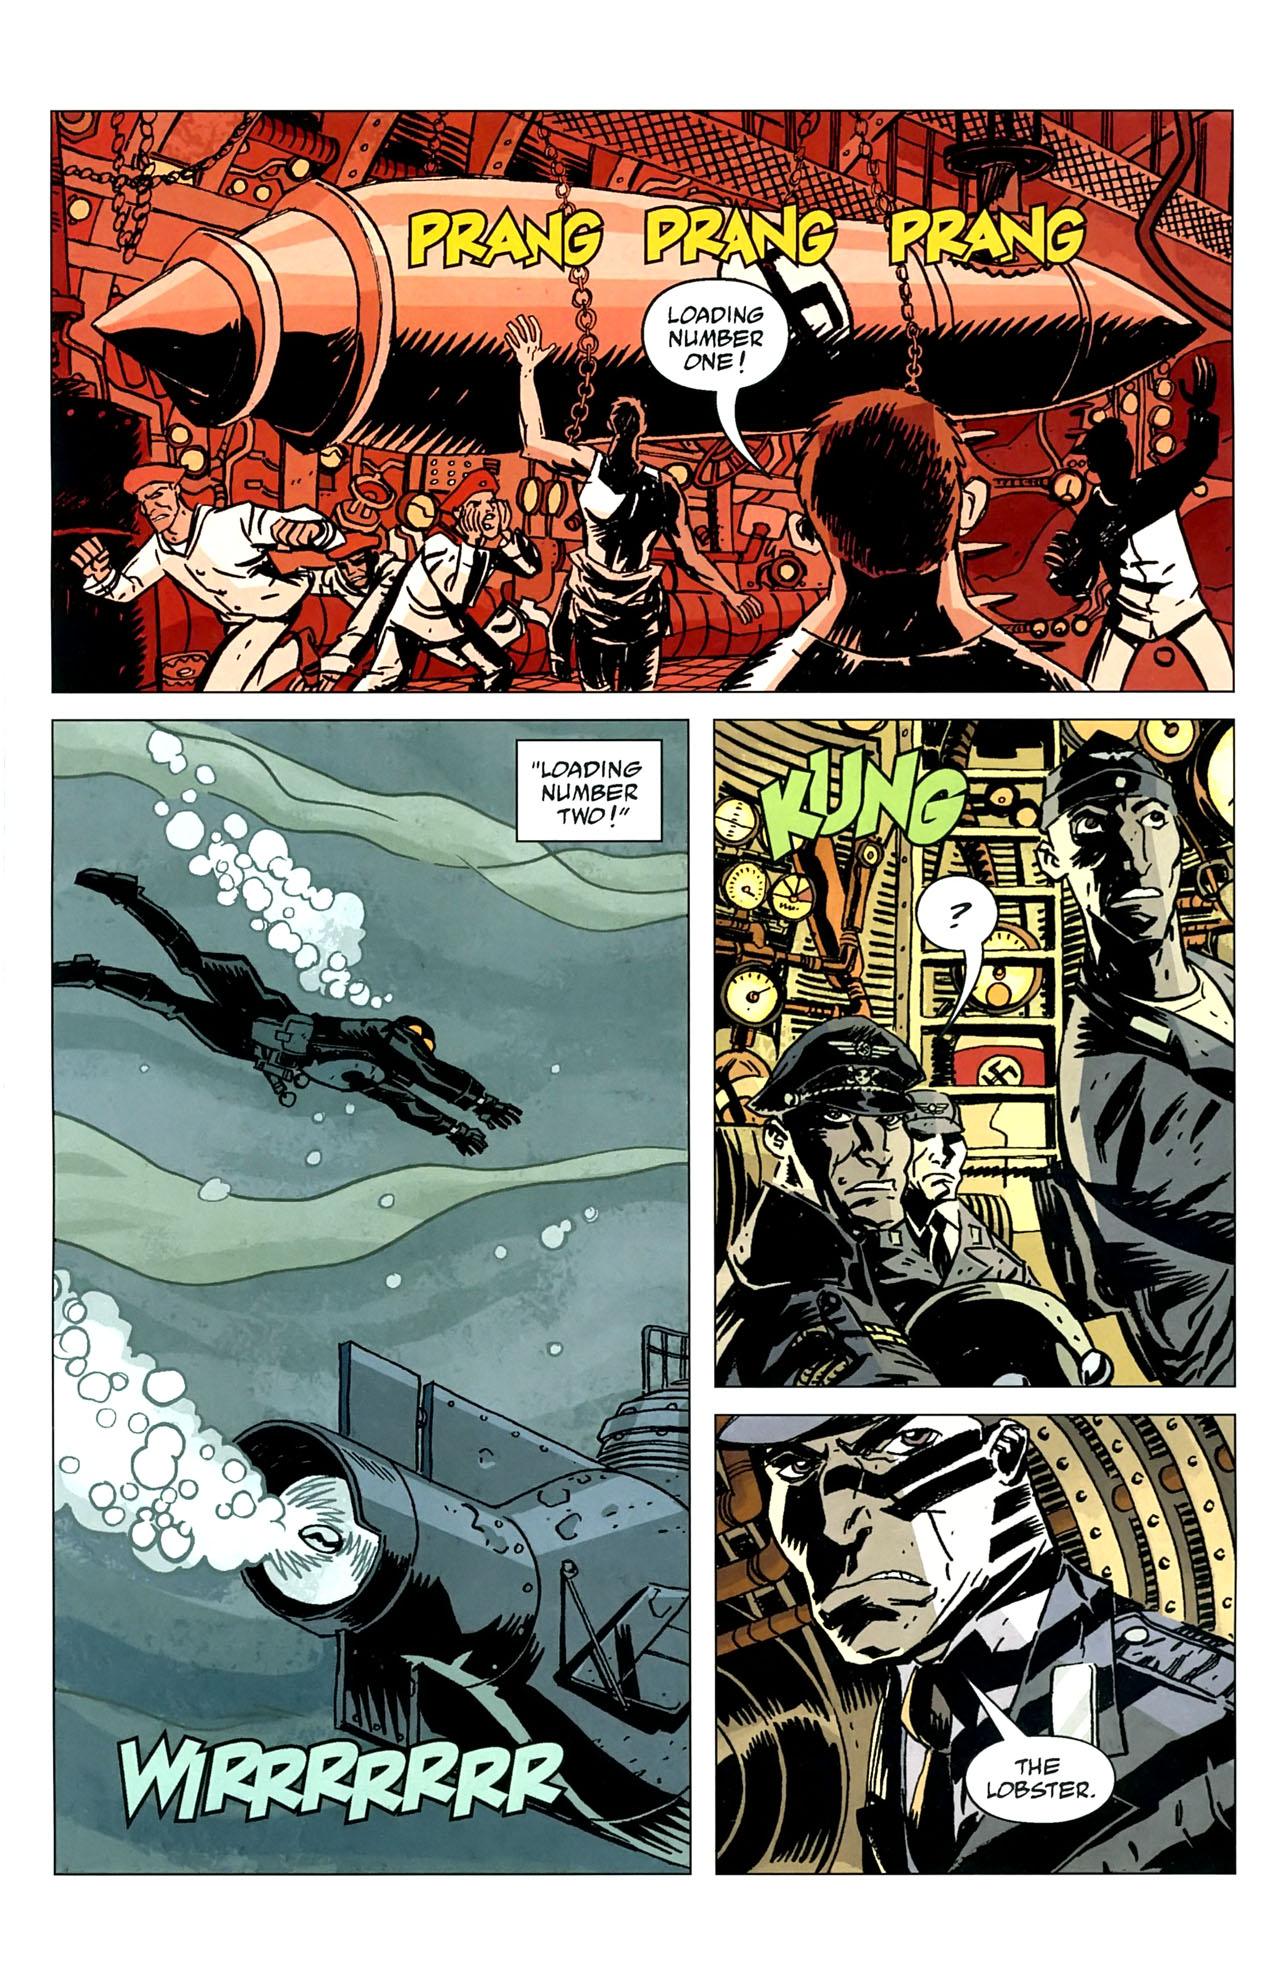 Read online Lobster Johnson: The Iron Prometheus comic -  Issue #5 - 14